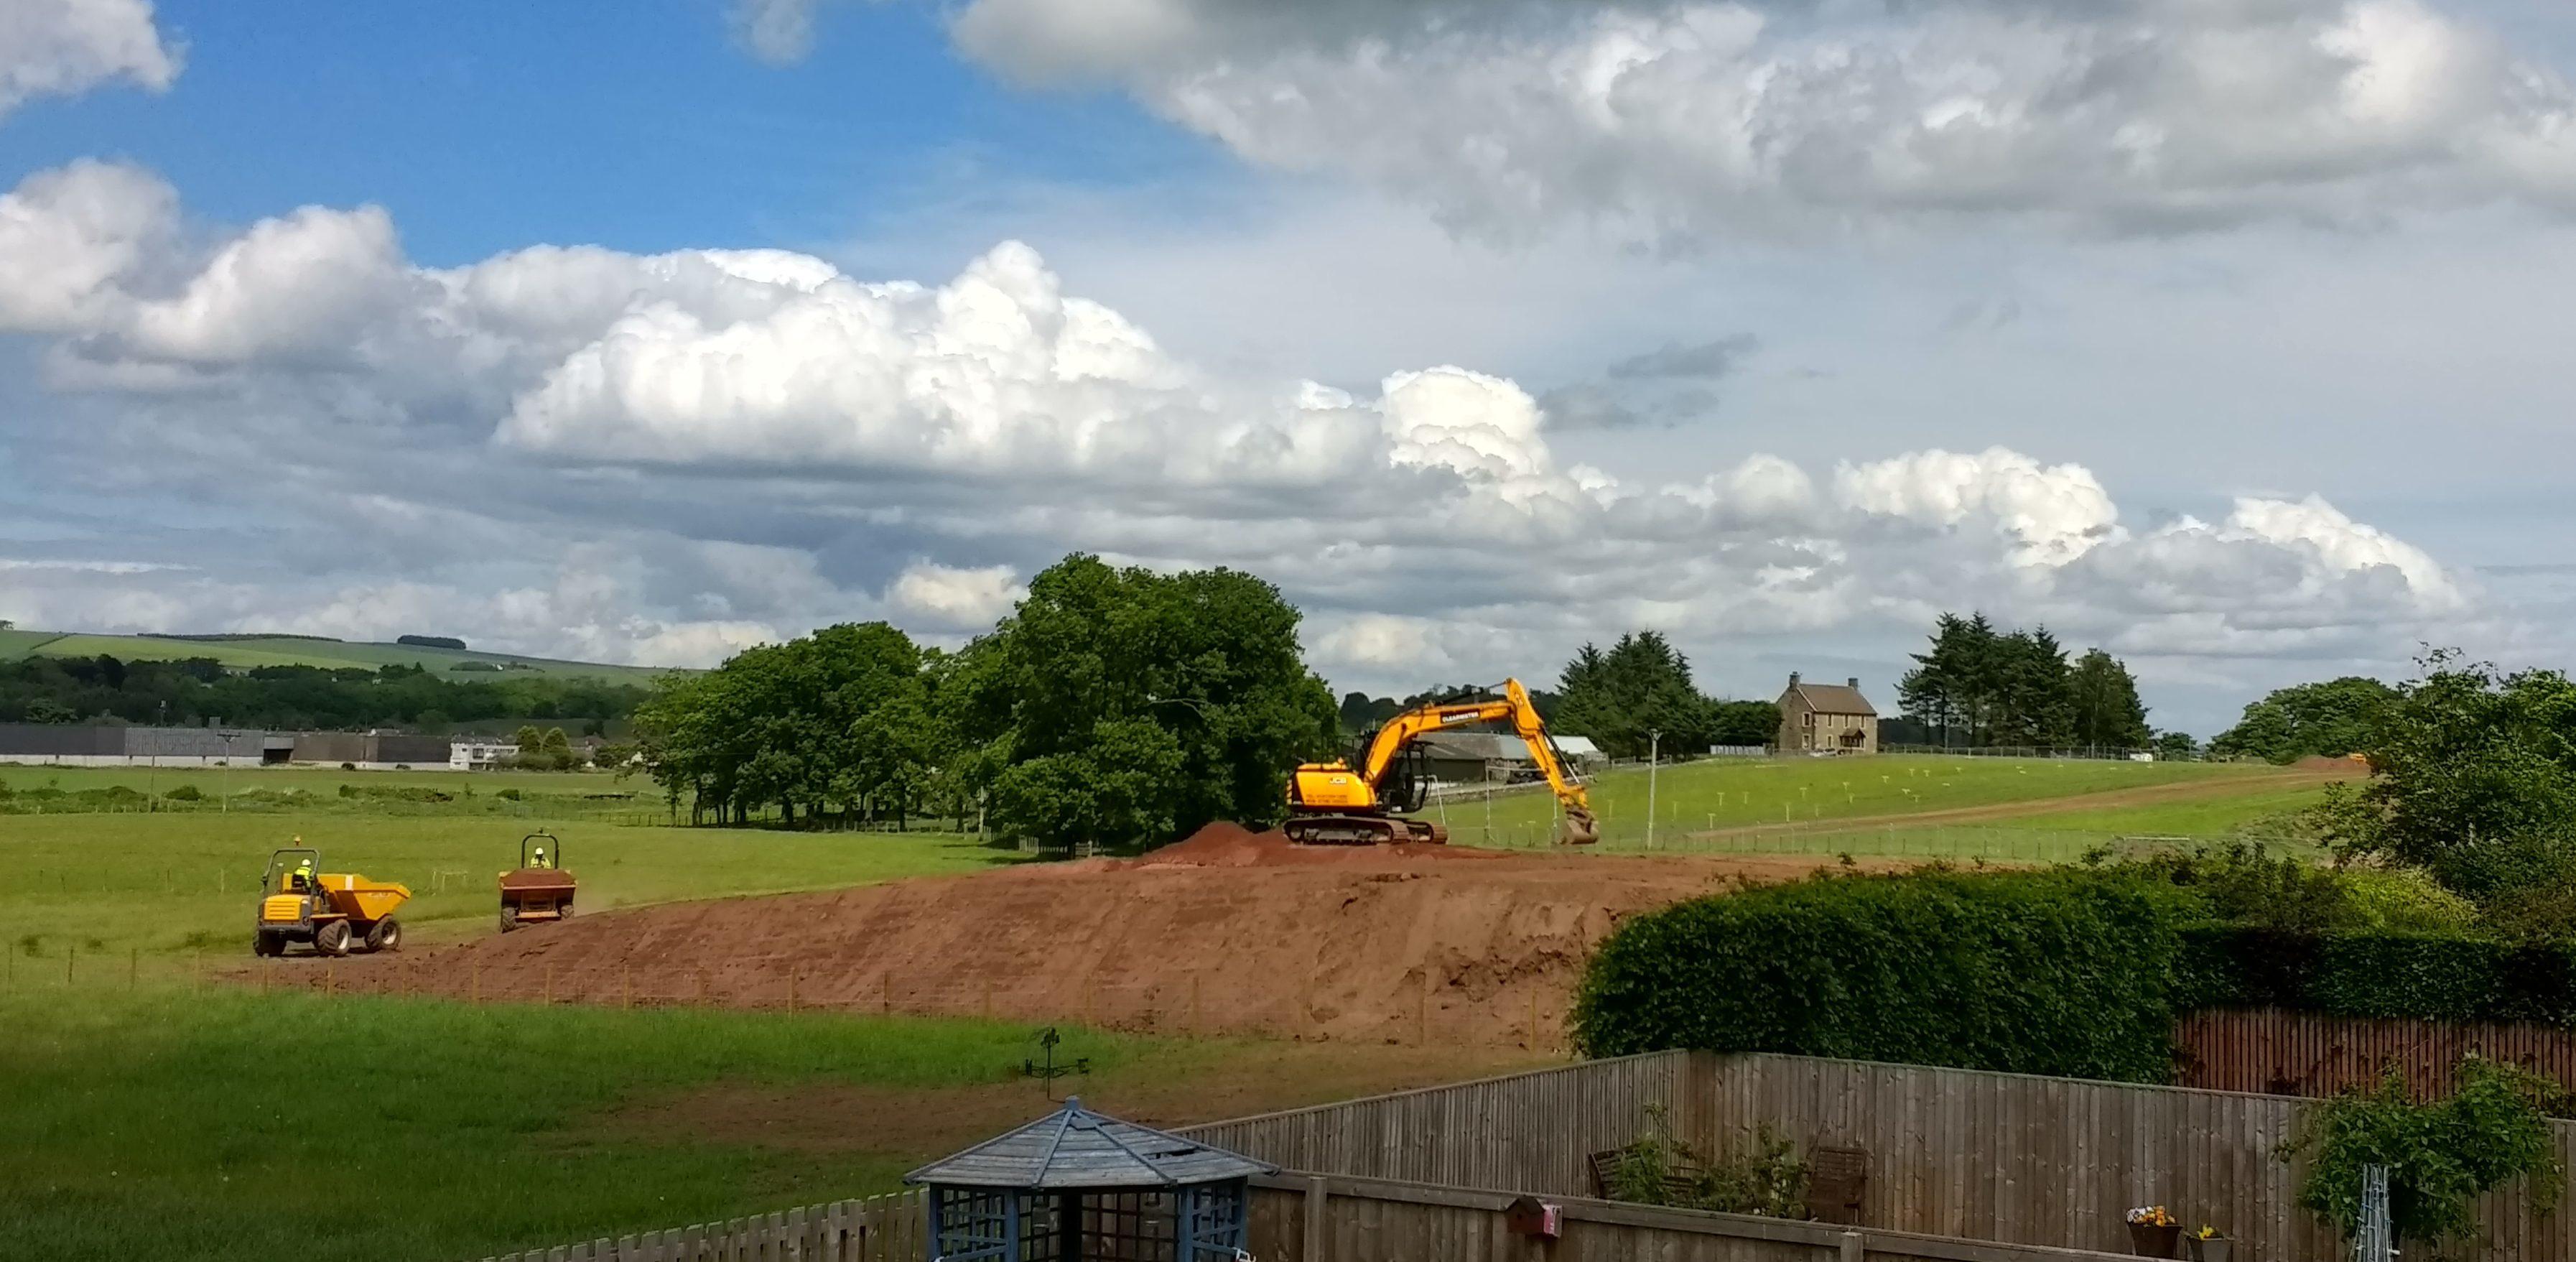 Work taking place at Lathro Farm, Kinross.